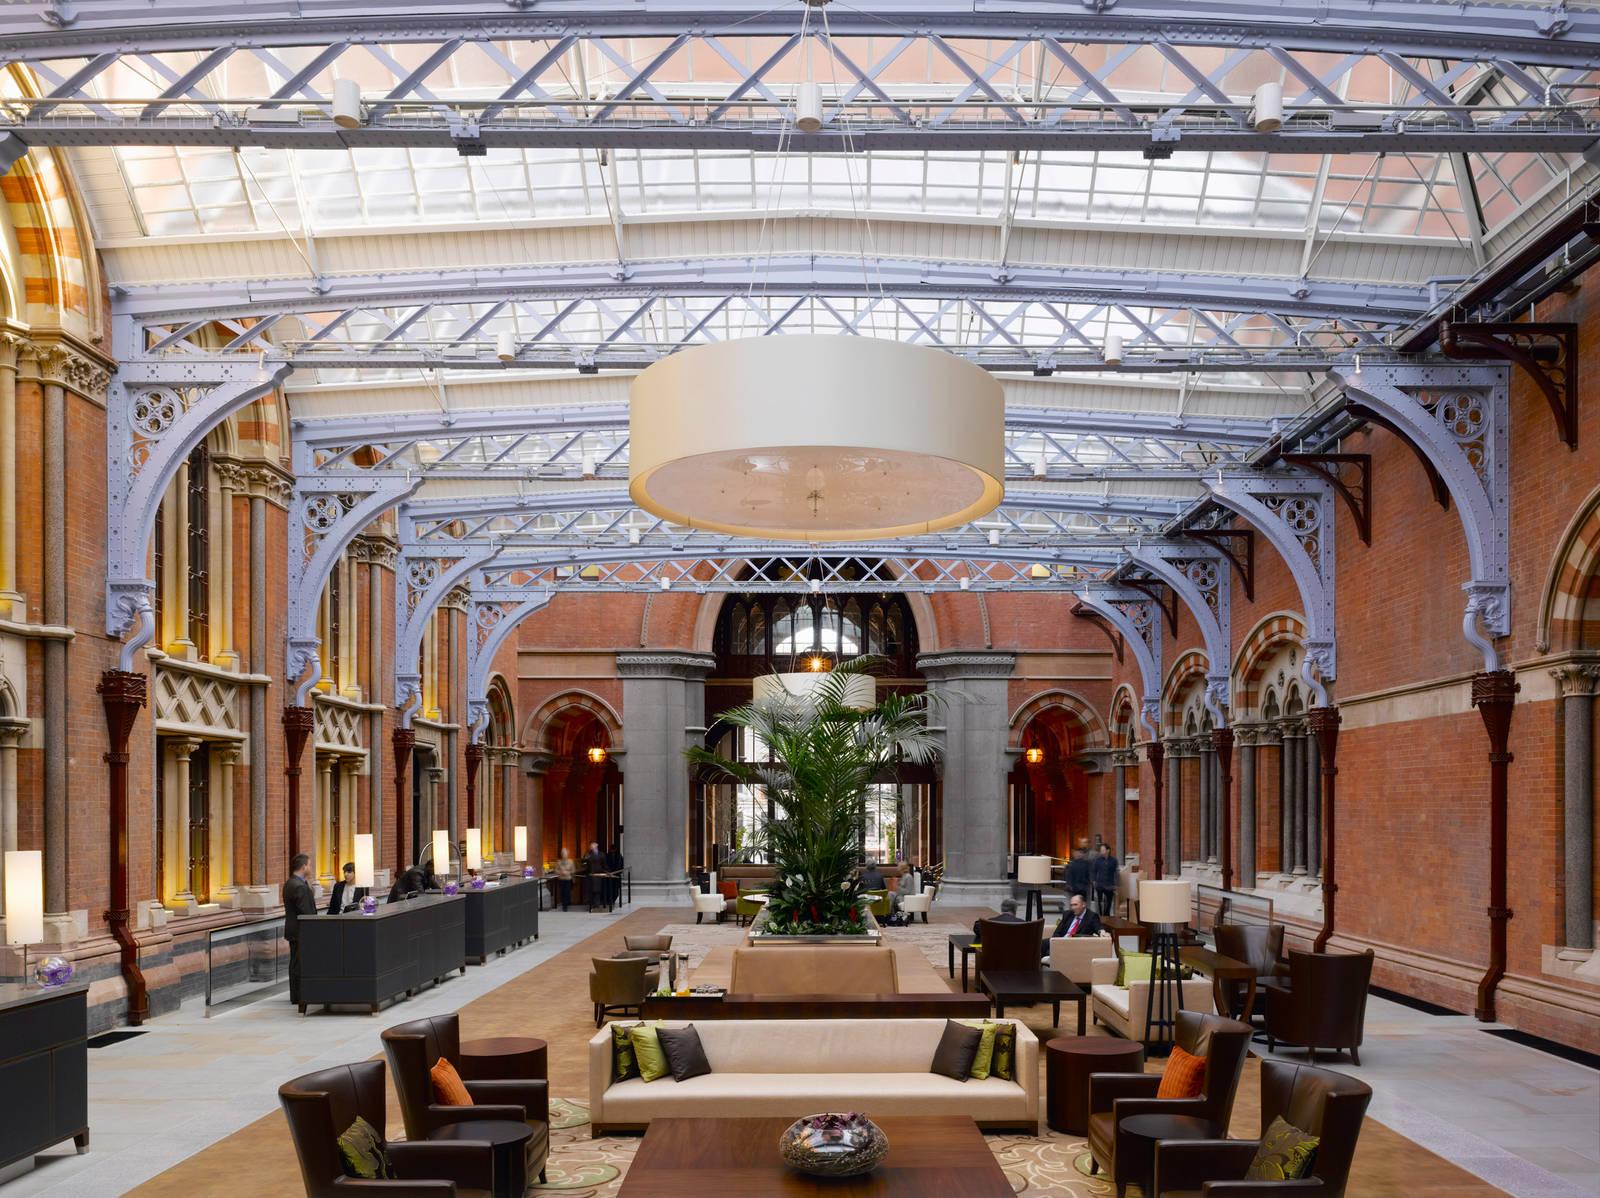 St Pancras Renaissance Hotel Luxury Hotel Restoration